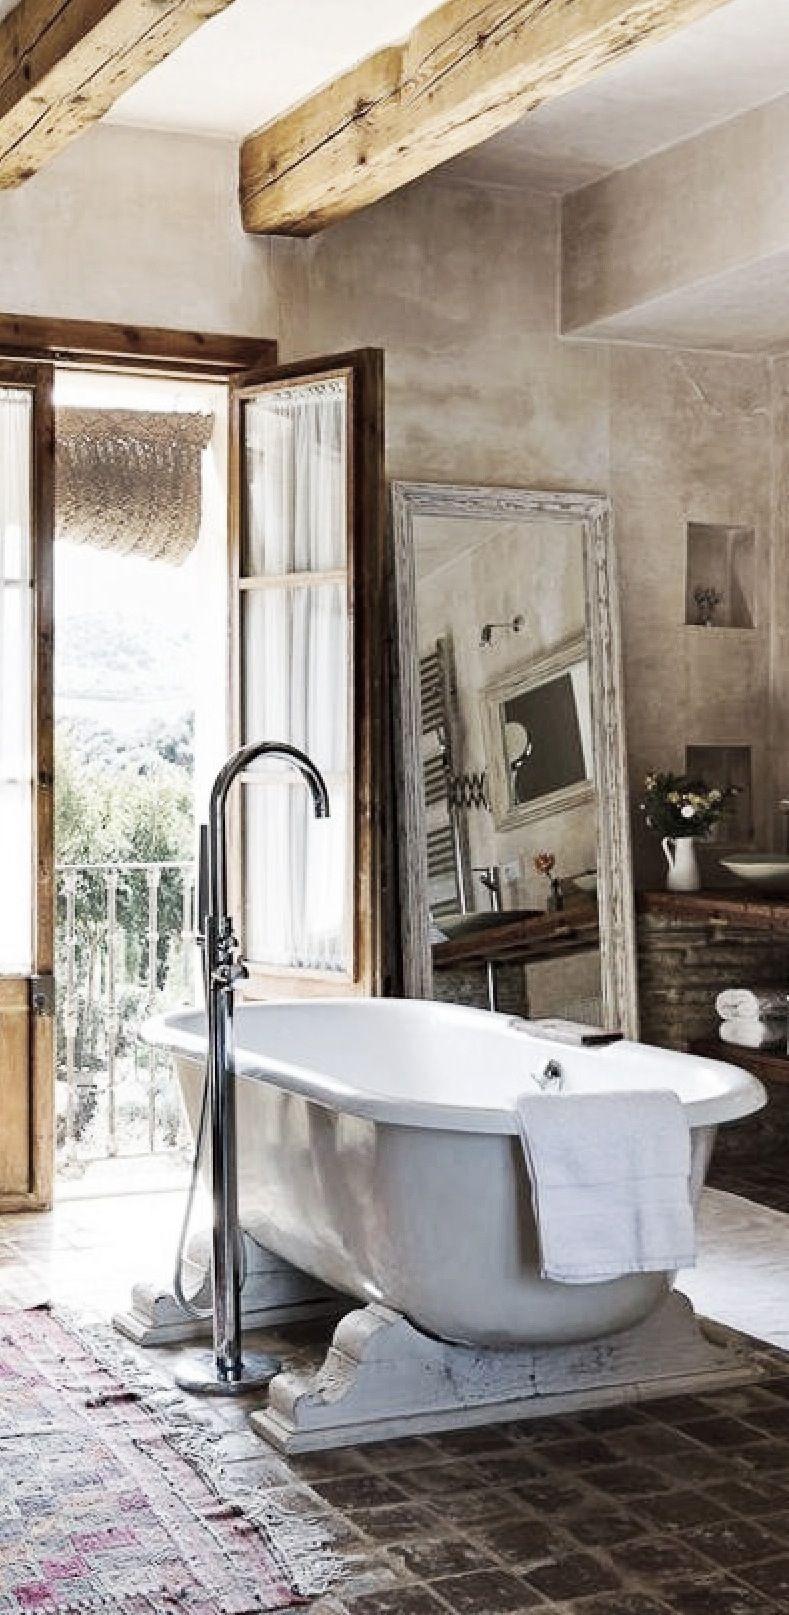 23 Bohemian Bathroom Designs   Ideas for the House ... on er design, ns design, l.a. design, blue sky design, color design, setzer design, pi design, berserk design, dy design, dj design,